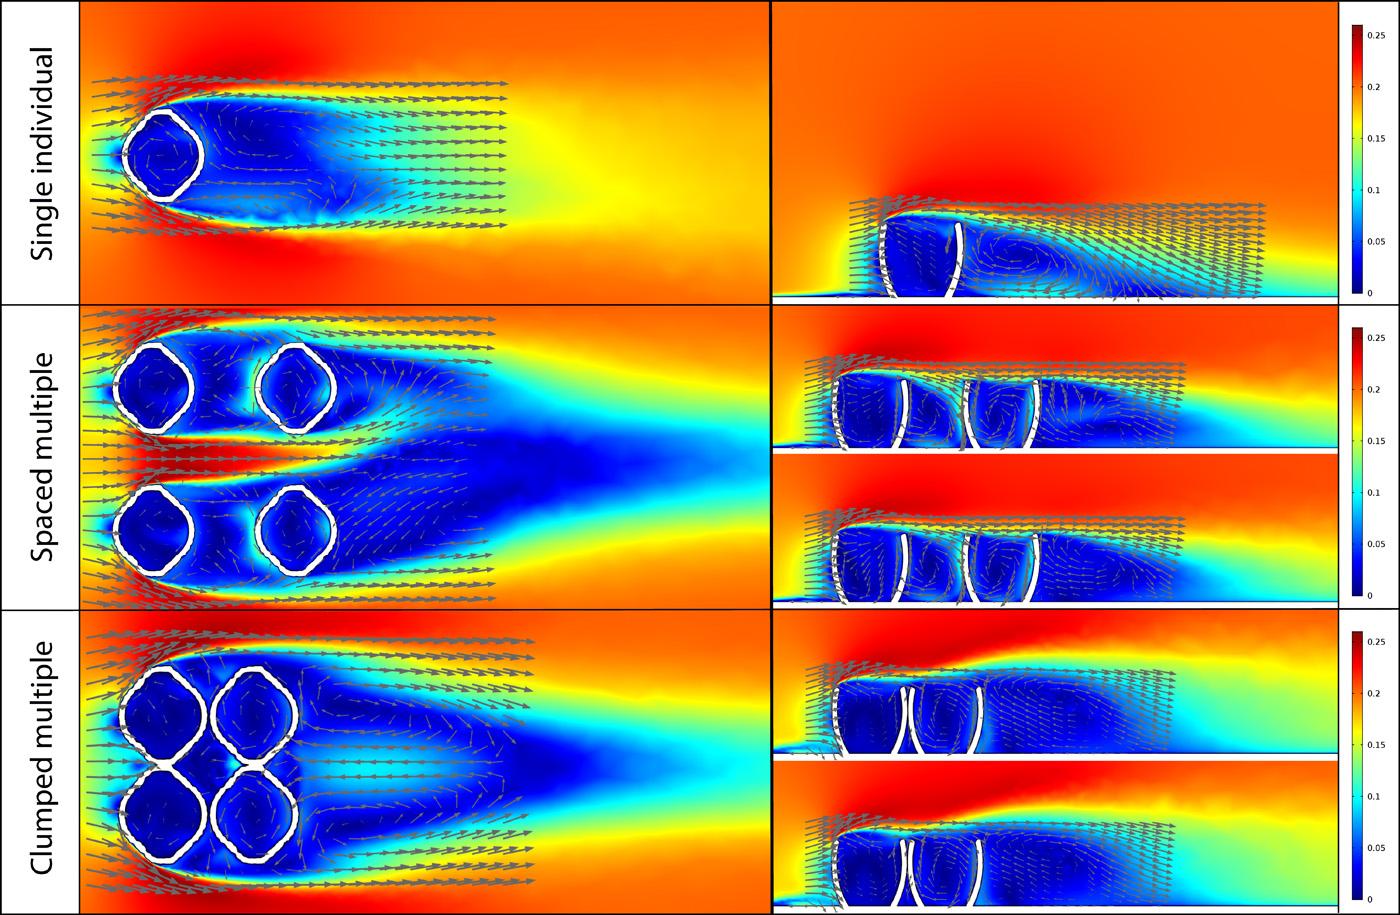 CFD simulation results for a single Ernietta model (top), a well-spaced population of Ernietta models (middle), and a clumped population of Ernietta models (bottom).